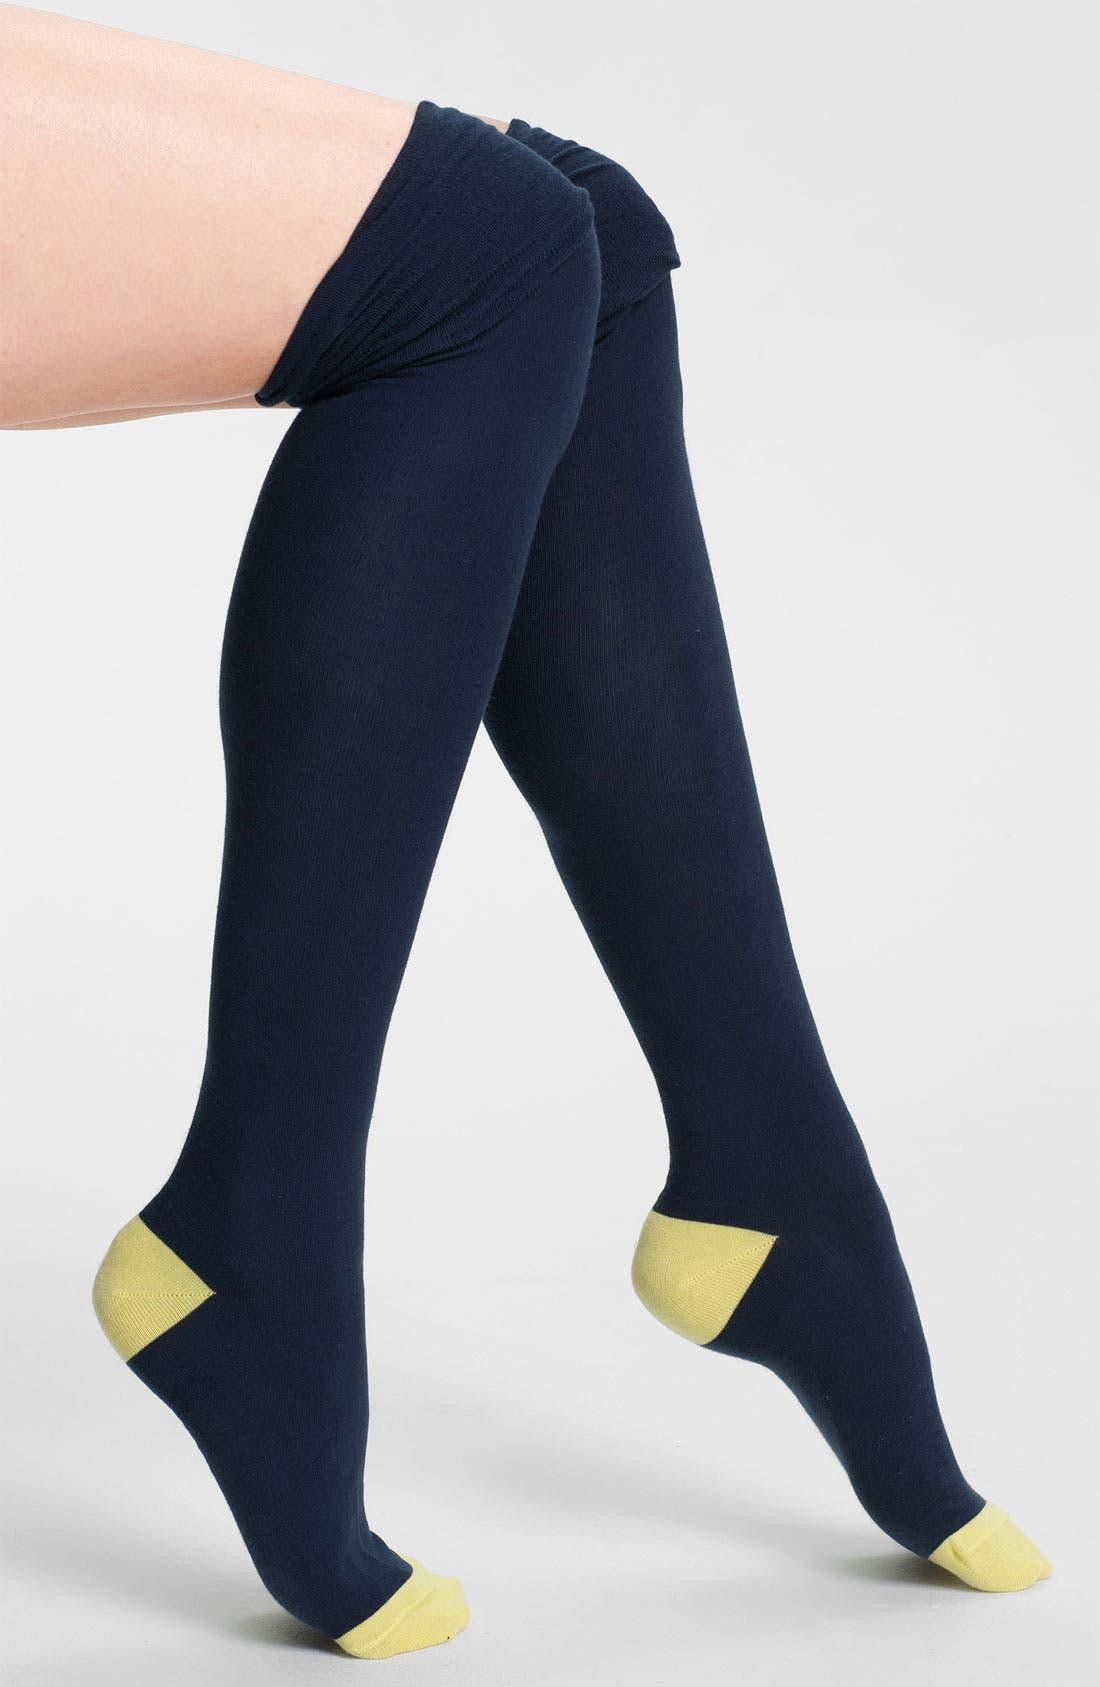 Alternate Image 1 Selected - Nordstrom 'Tip Top' Over the Knee Socks